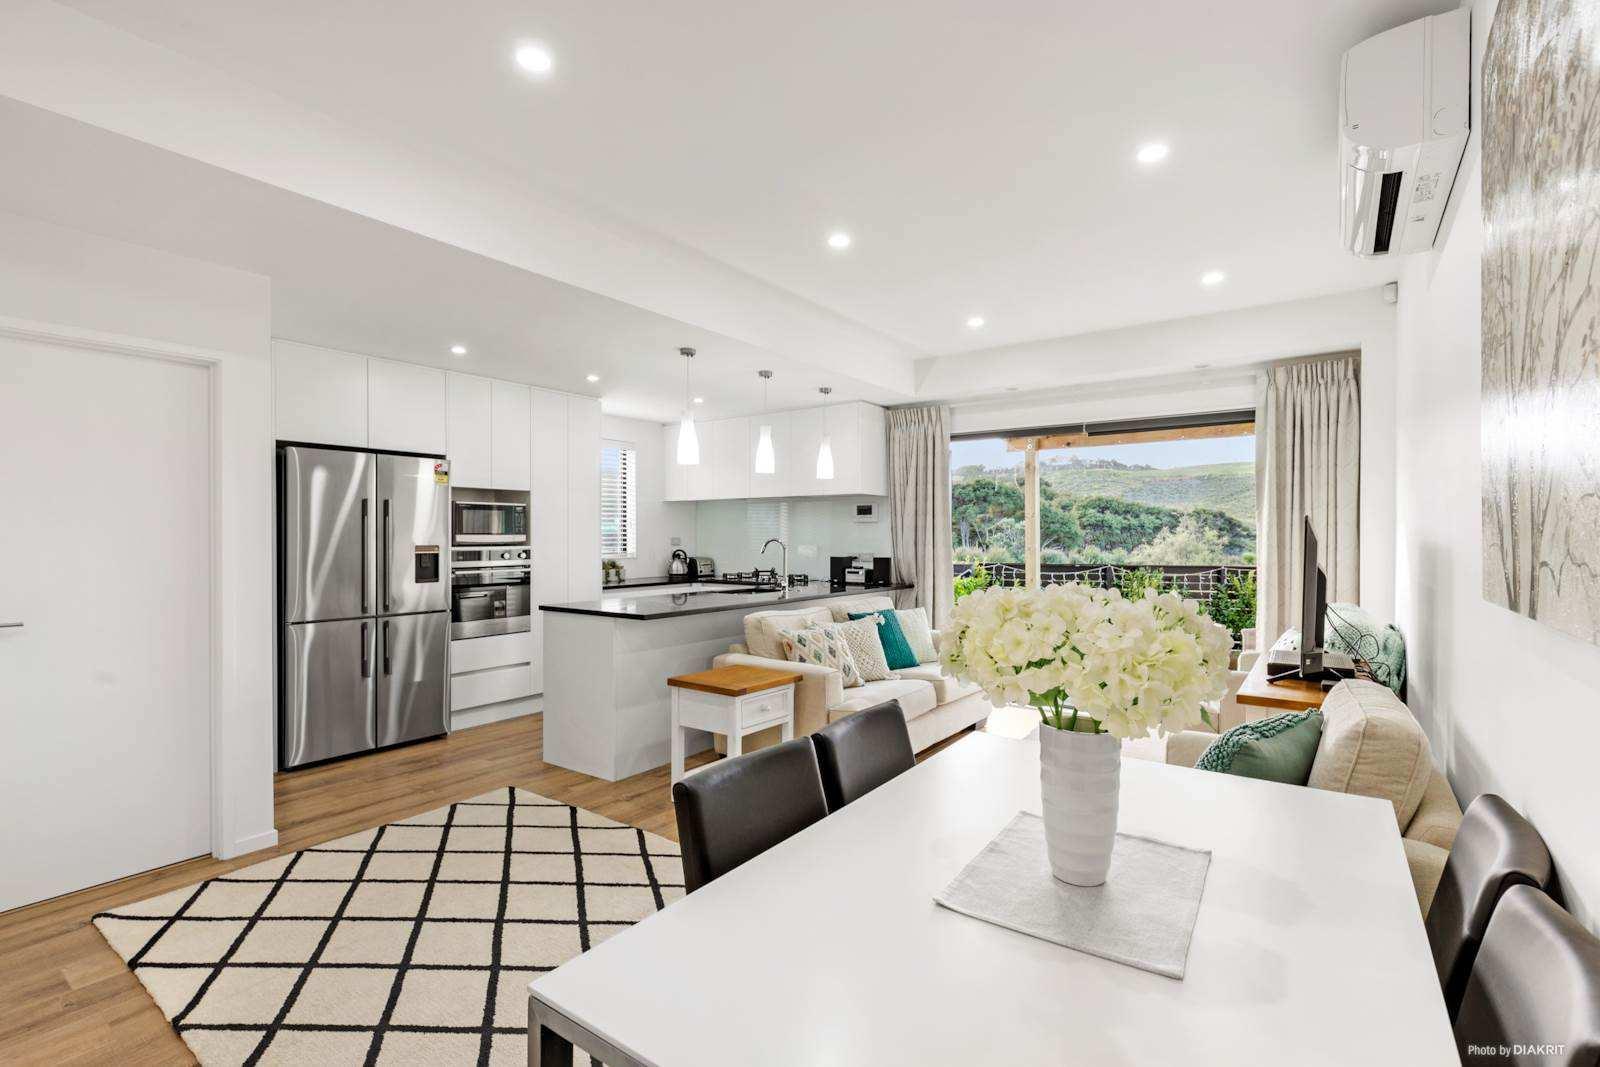 Long Bay 2房 黄金拐角精致城市屋 维护成本低 带精致花园&阳光庭院 优质学校荟萃 适合多种类型买家 Simplify Your Life